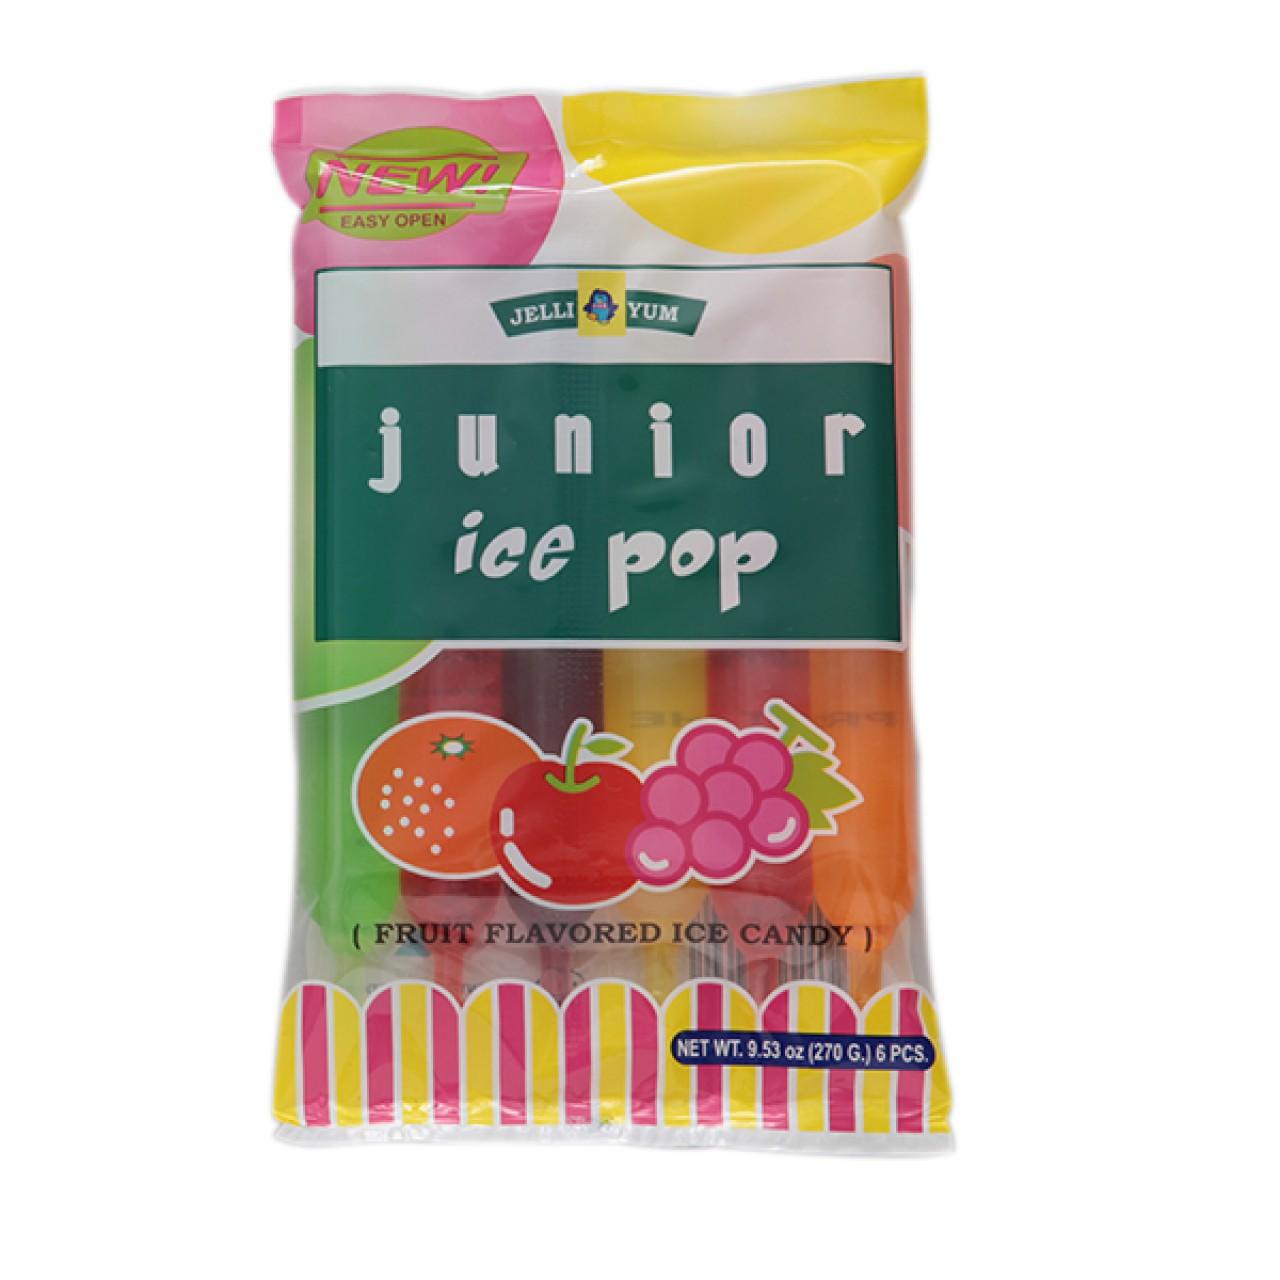 JELLIYUM JUNIOR ICEPOP 6'S